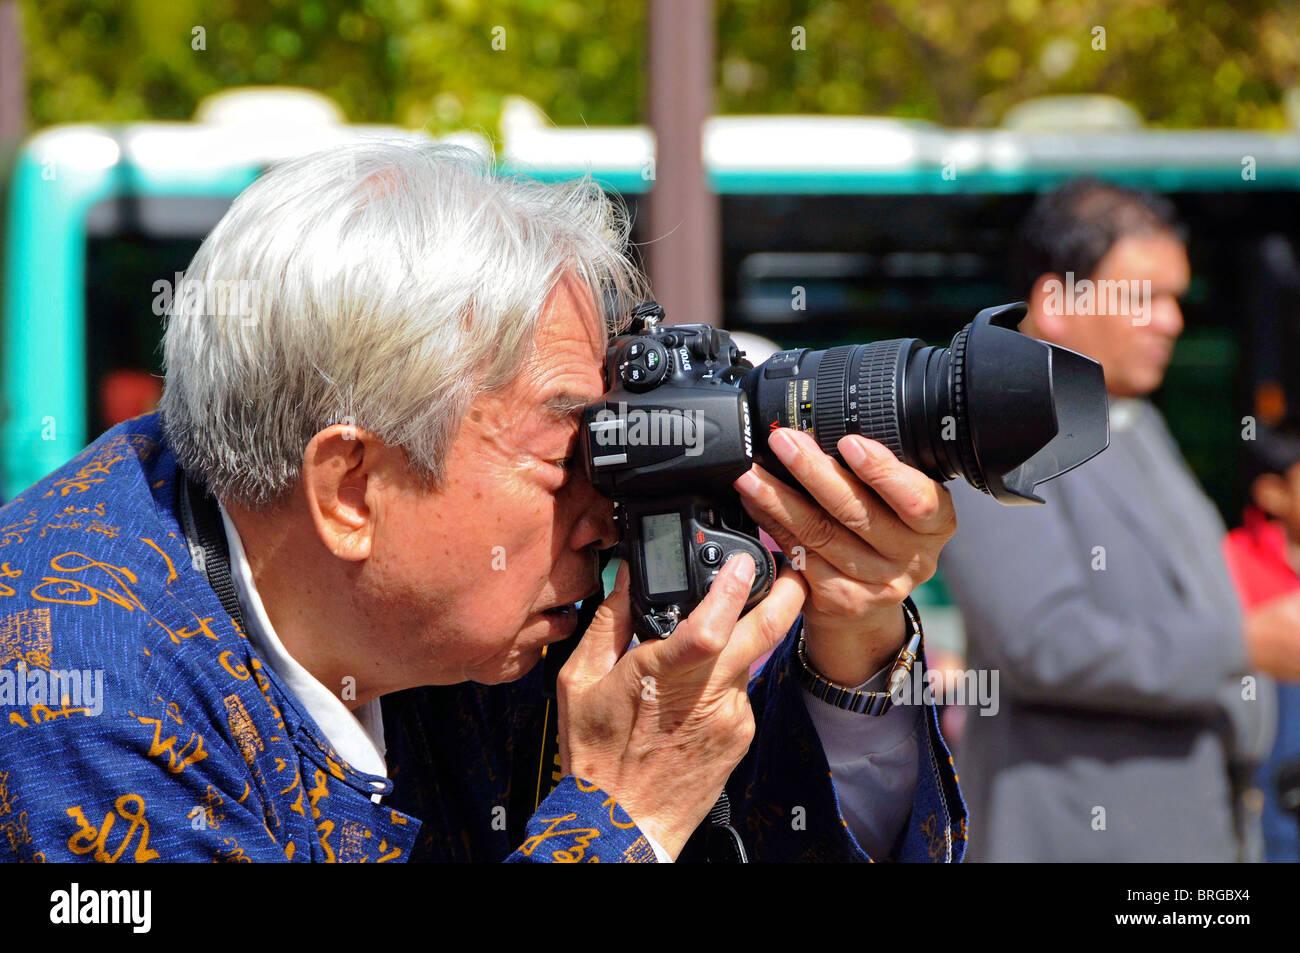 A Japanese tourist with Nikon camera. - Stock Image